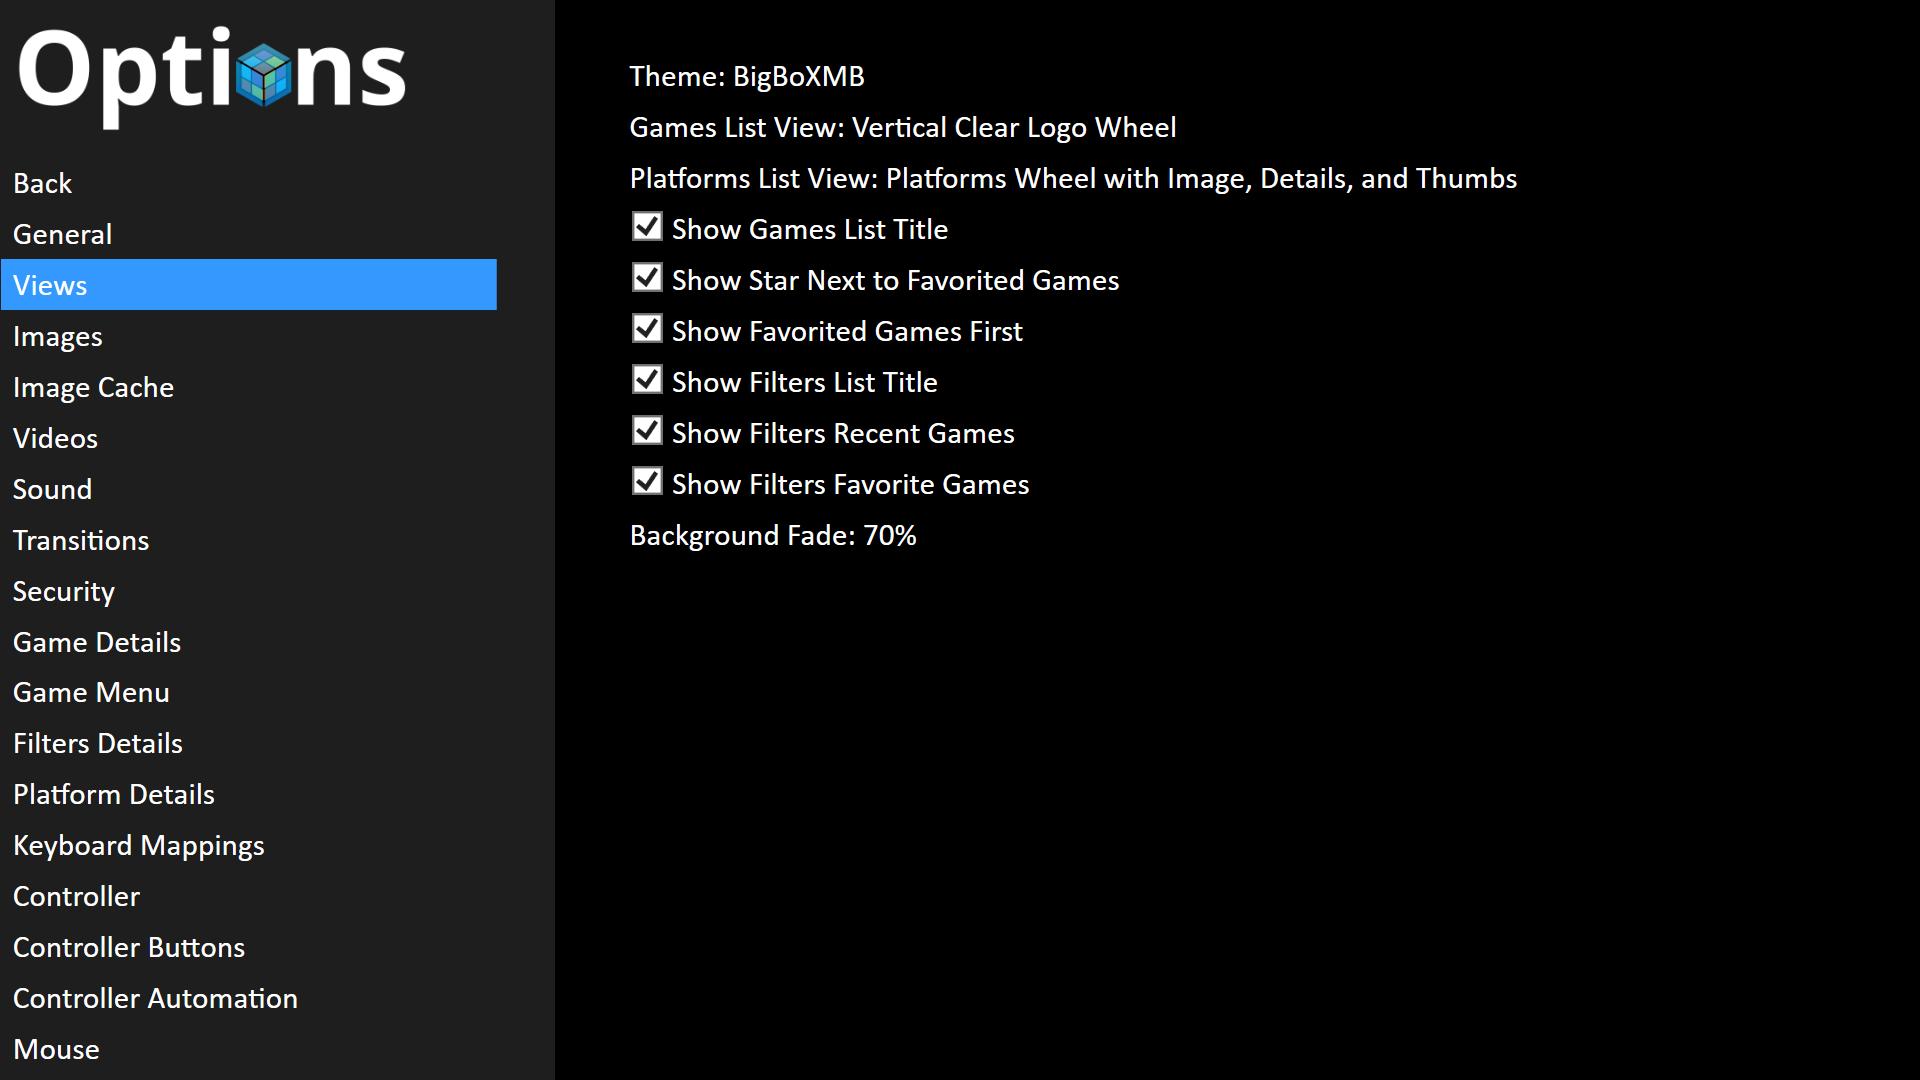 BigBoXMB - Big Box Custom Themes - LaunchBox Community Forums